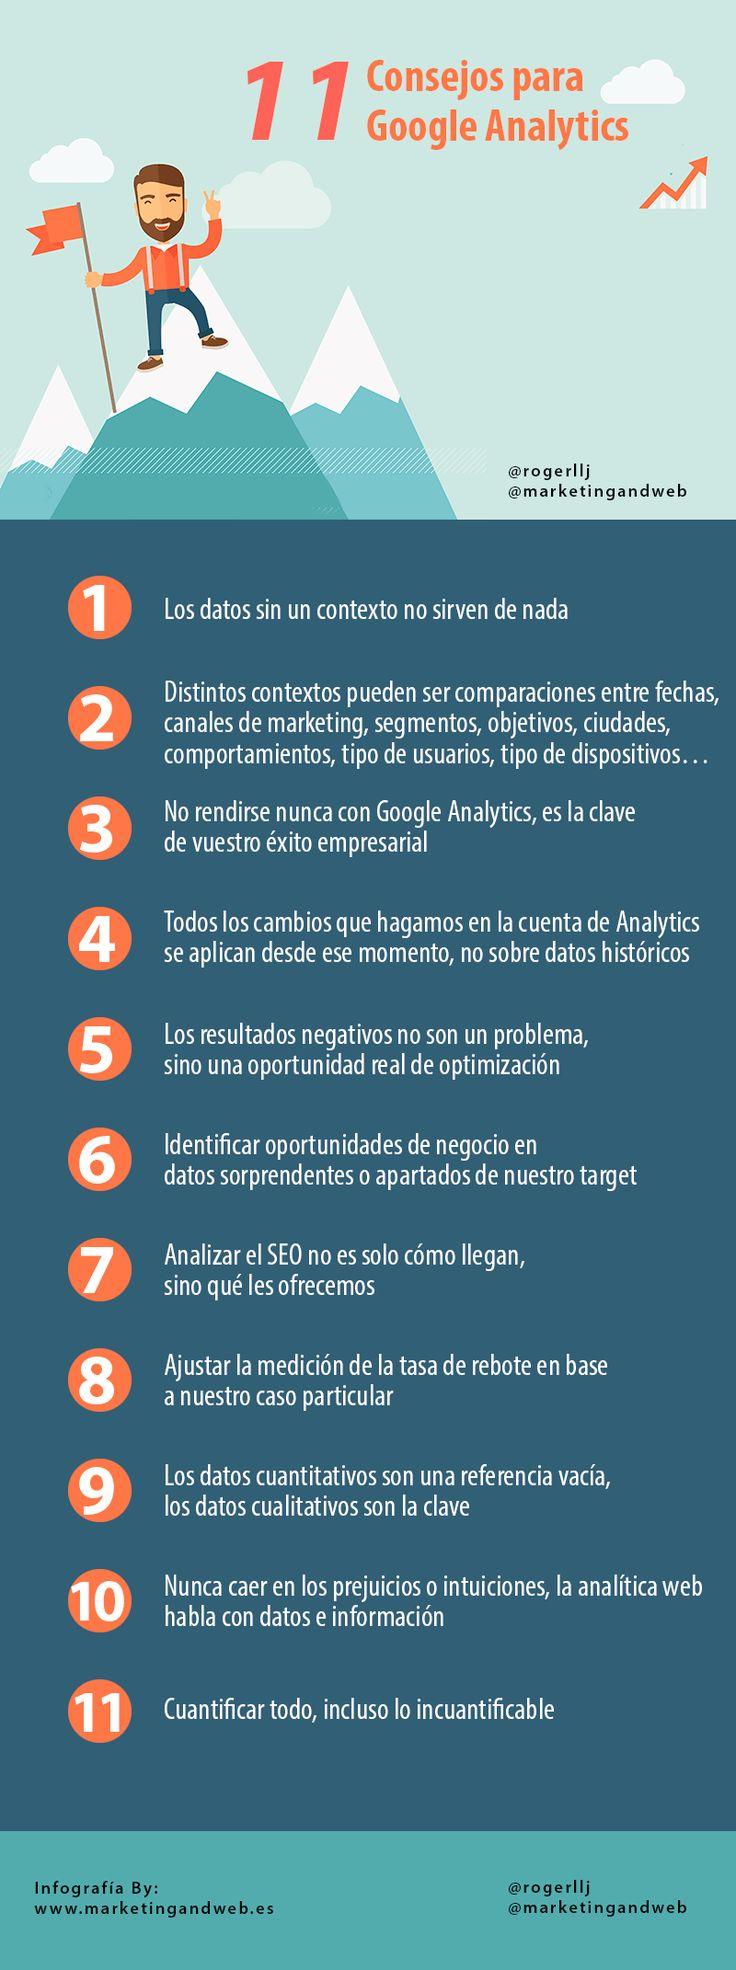 11 consejos para Google Analytics #infografia #infographic #marketing